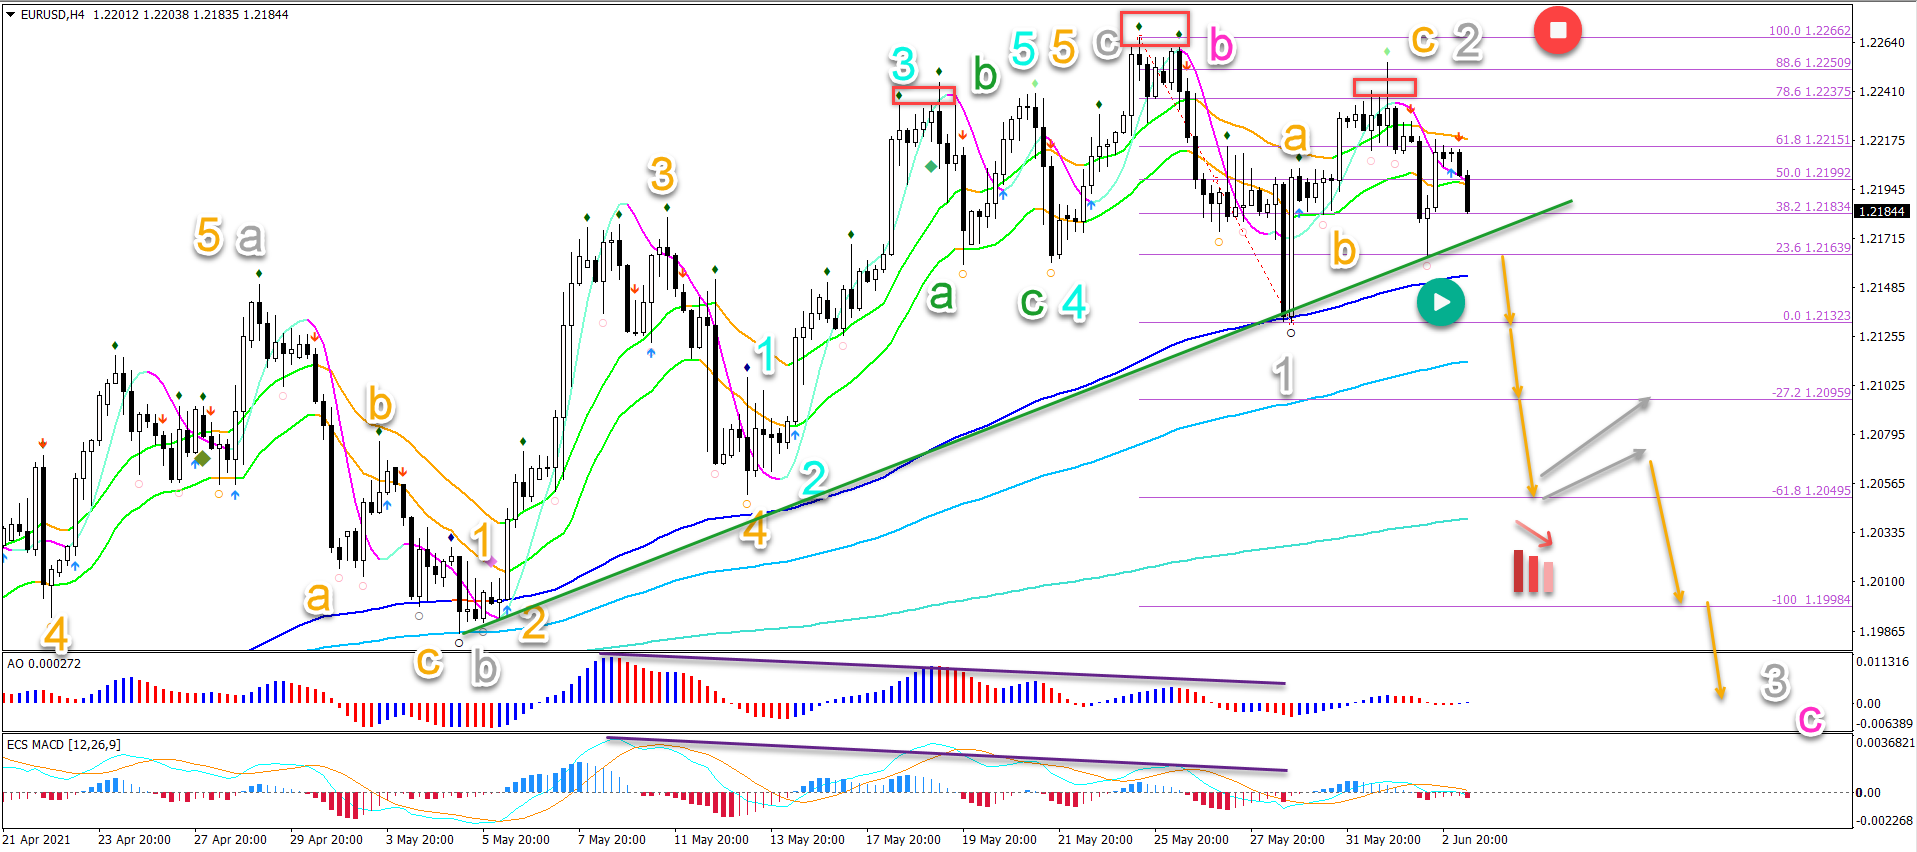 EUR/USD 03.06.2021 4 hour chart